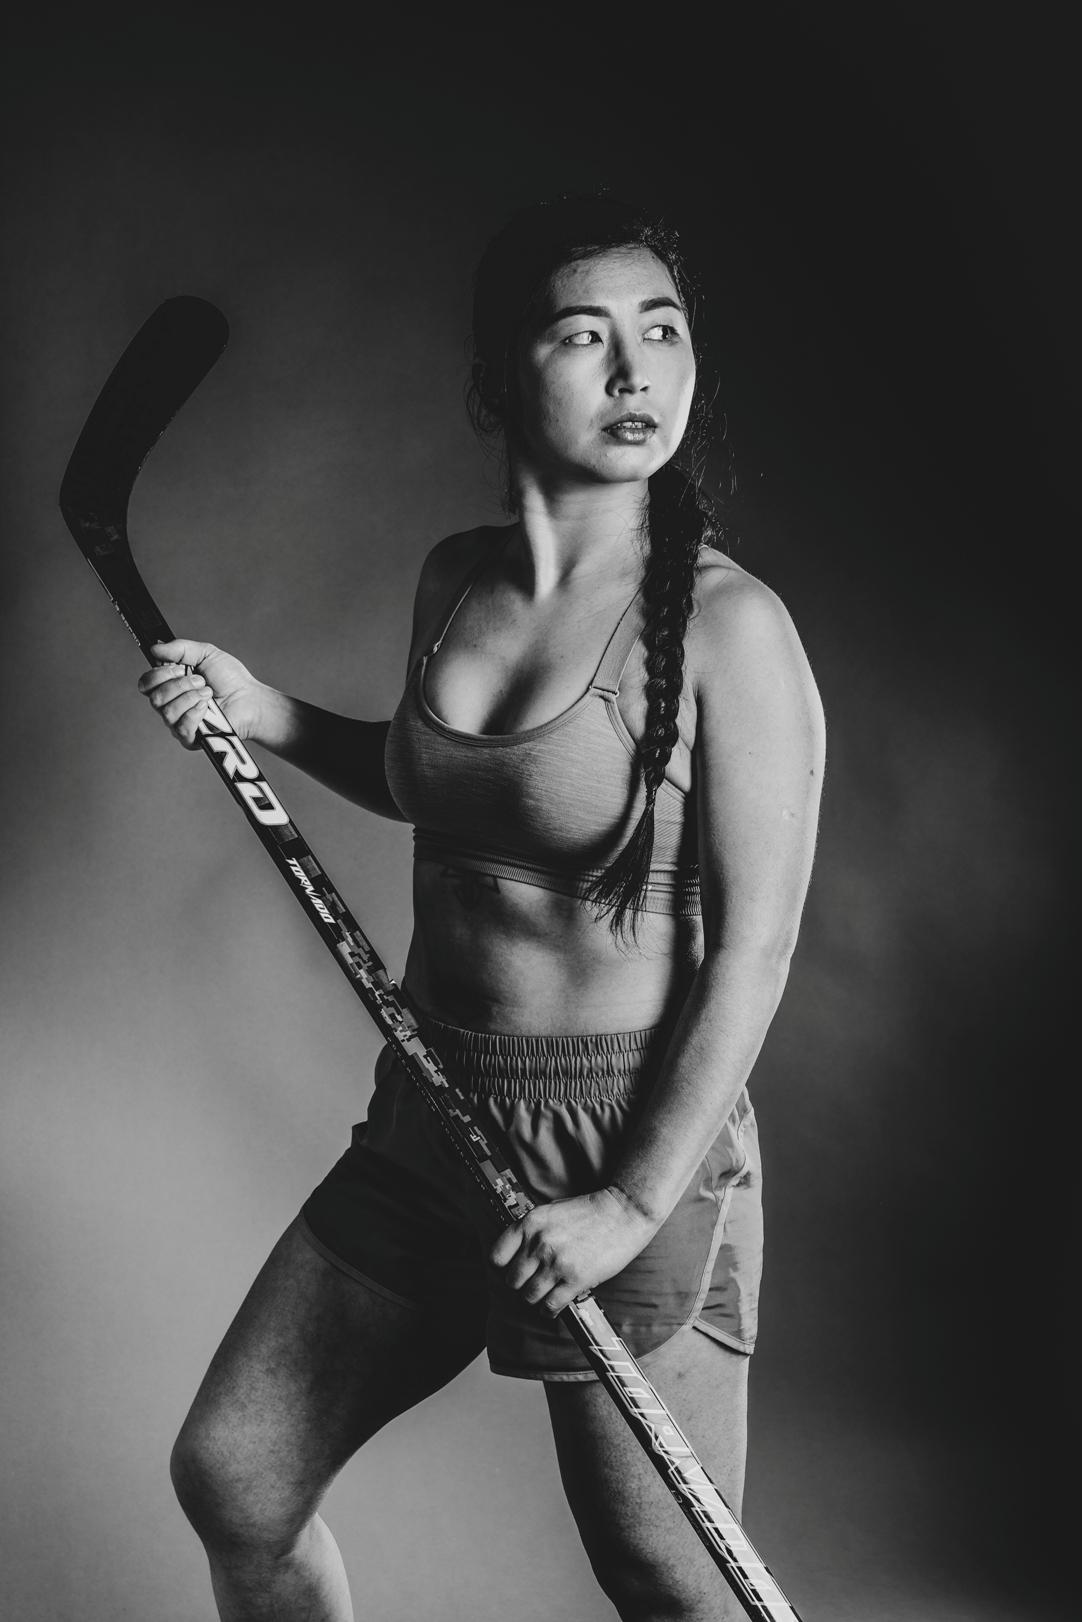 Bulbul Kartanbay: The Personal Triumph of a Kazakh Athlete